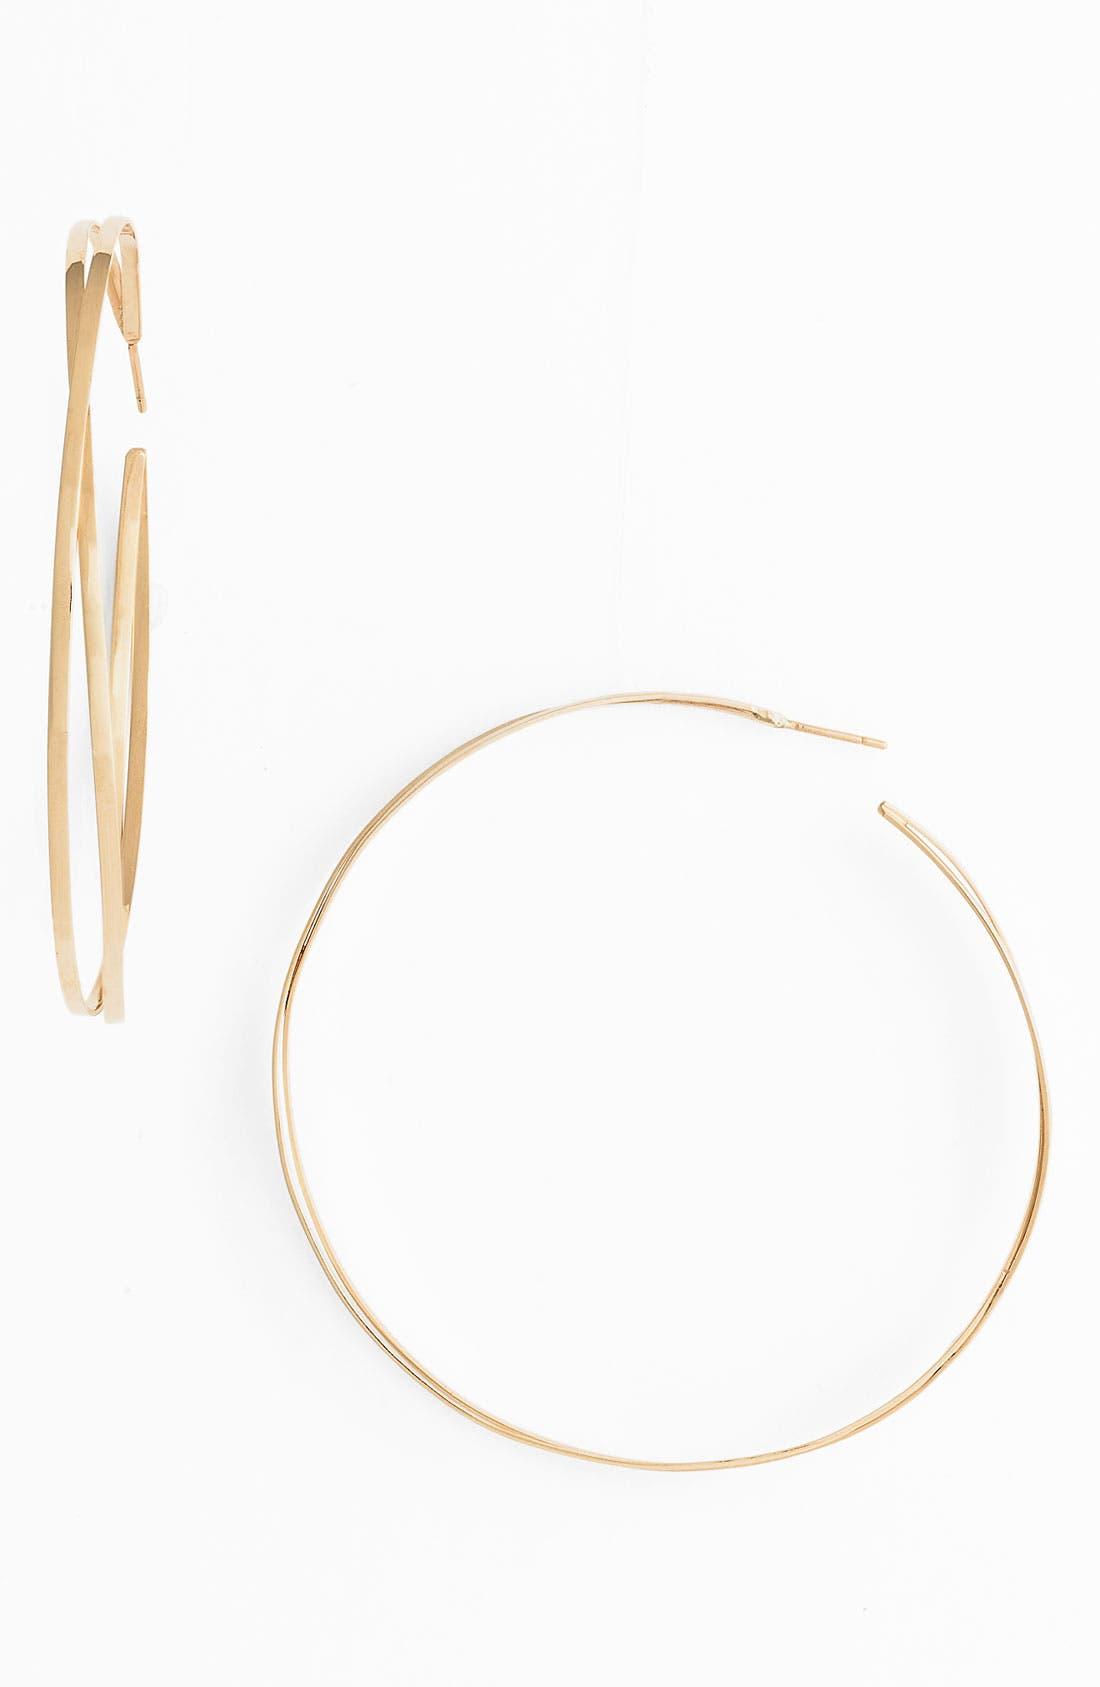 Main Image - Lana Jewelry 'Decades' Twisted Hoop Earrings